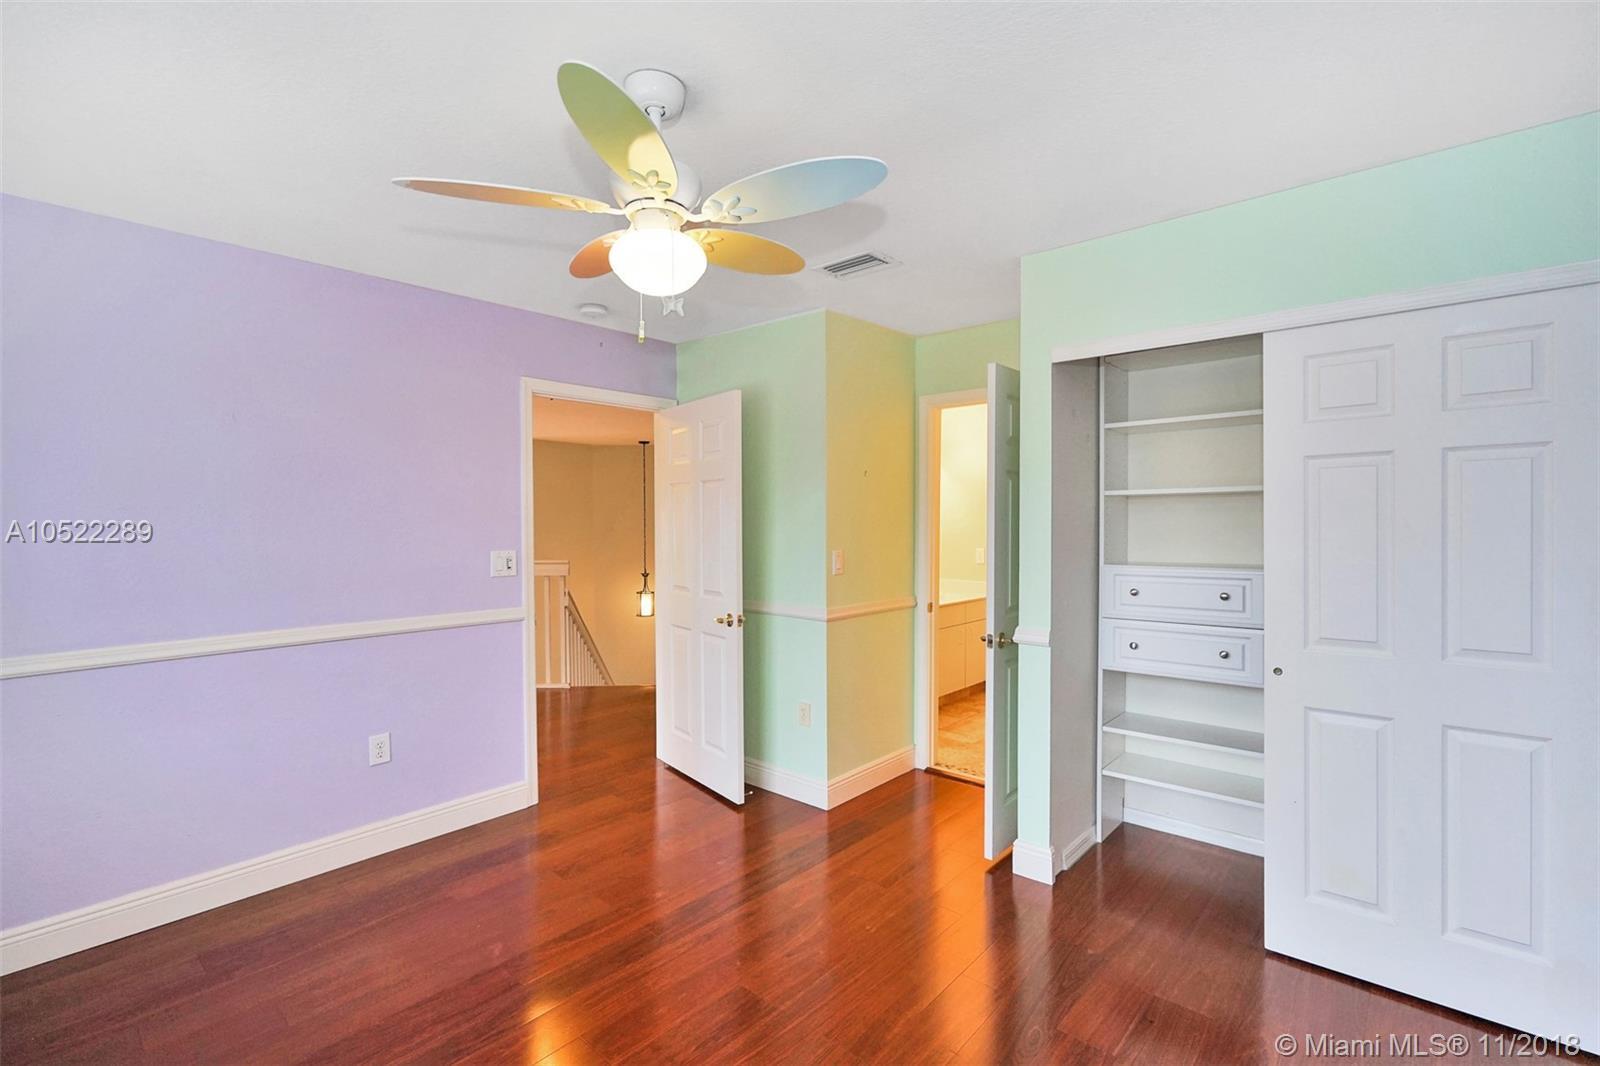 16505 Turquoise Trl, Weston, FL 33331